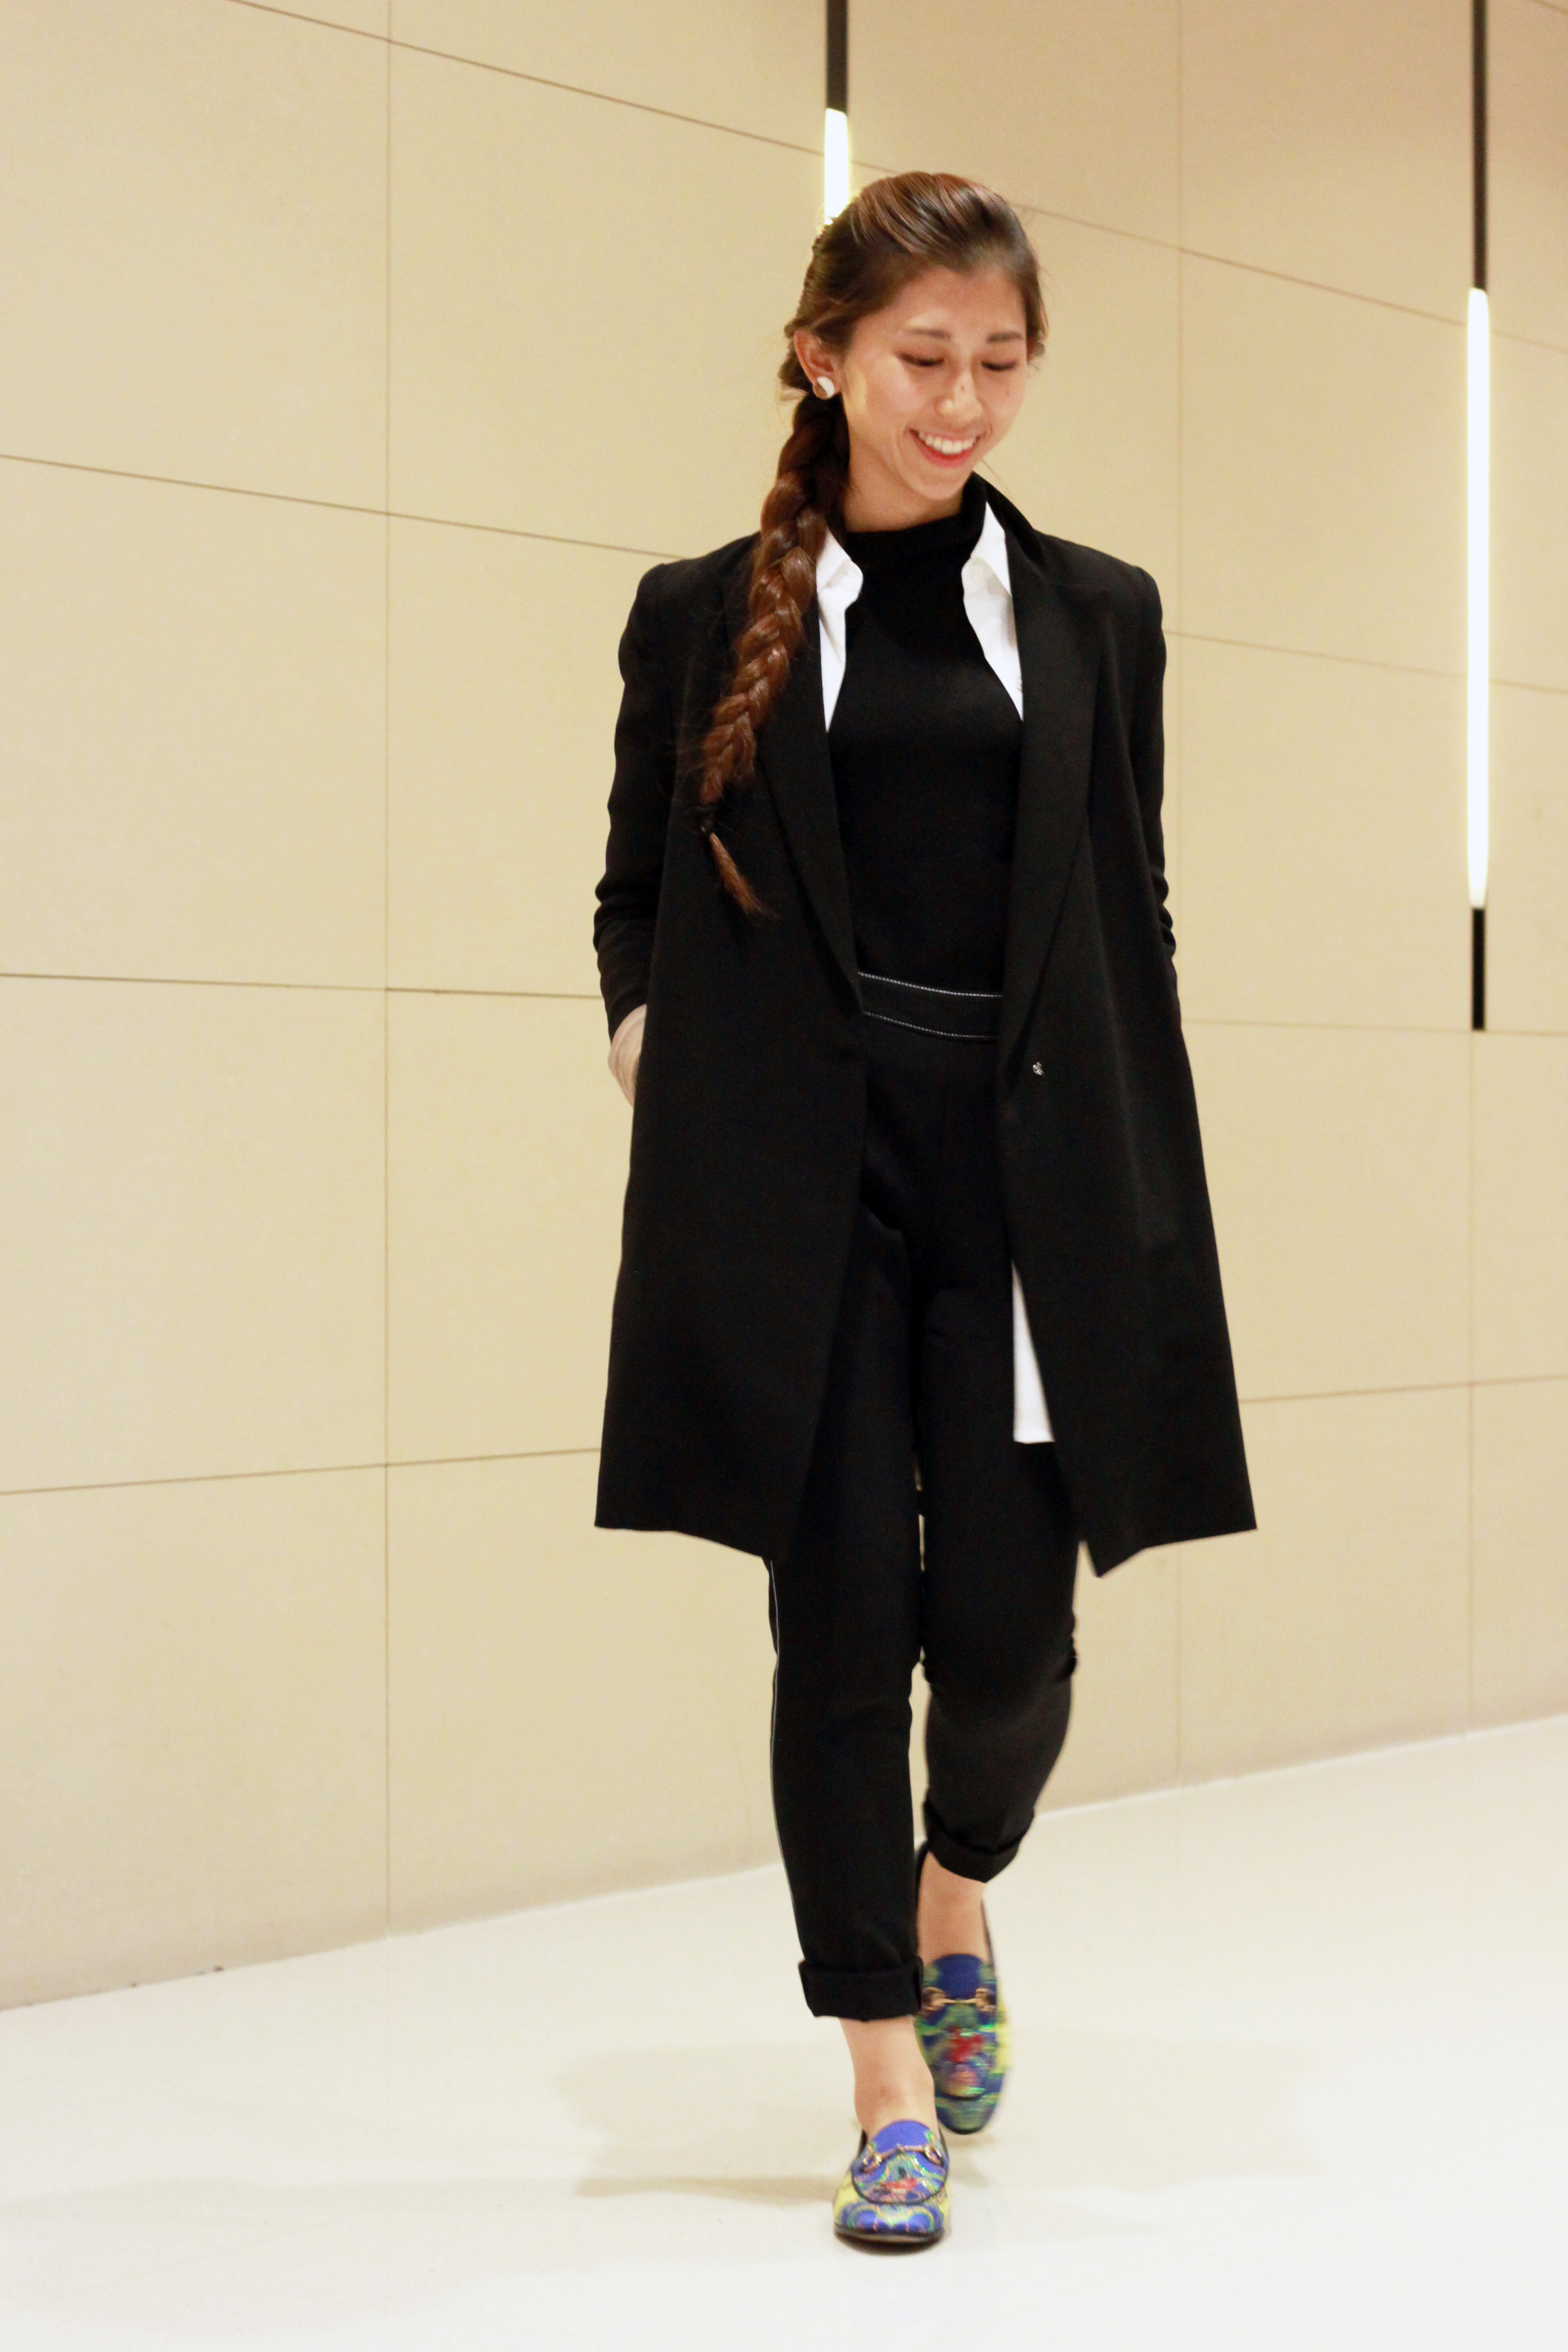 Long black blazer / Theory white shirt / Giordano Ladies cashmere black knit / Giordano Ladies pyjamas pant /  Gucci Jordaan horsebit-detailed jacquard loafers